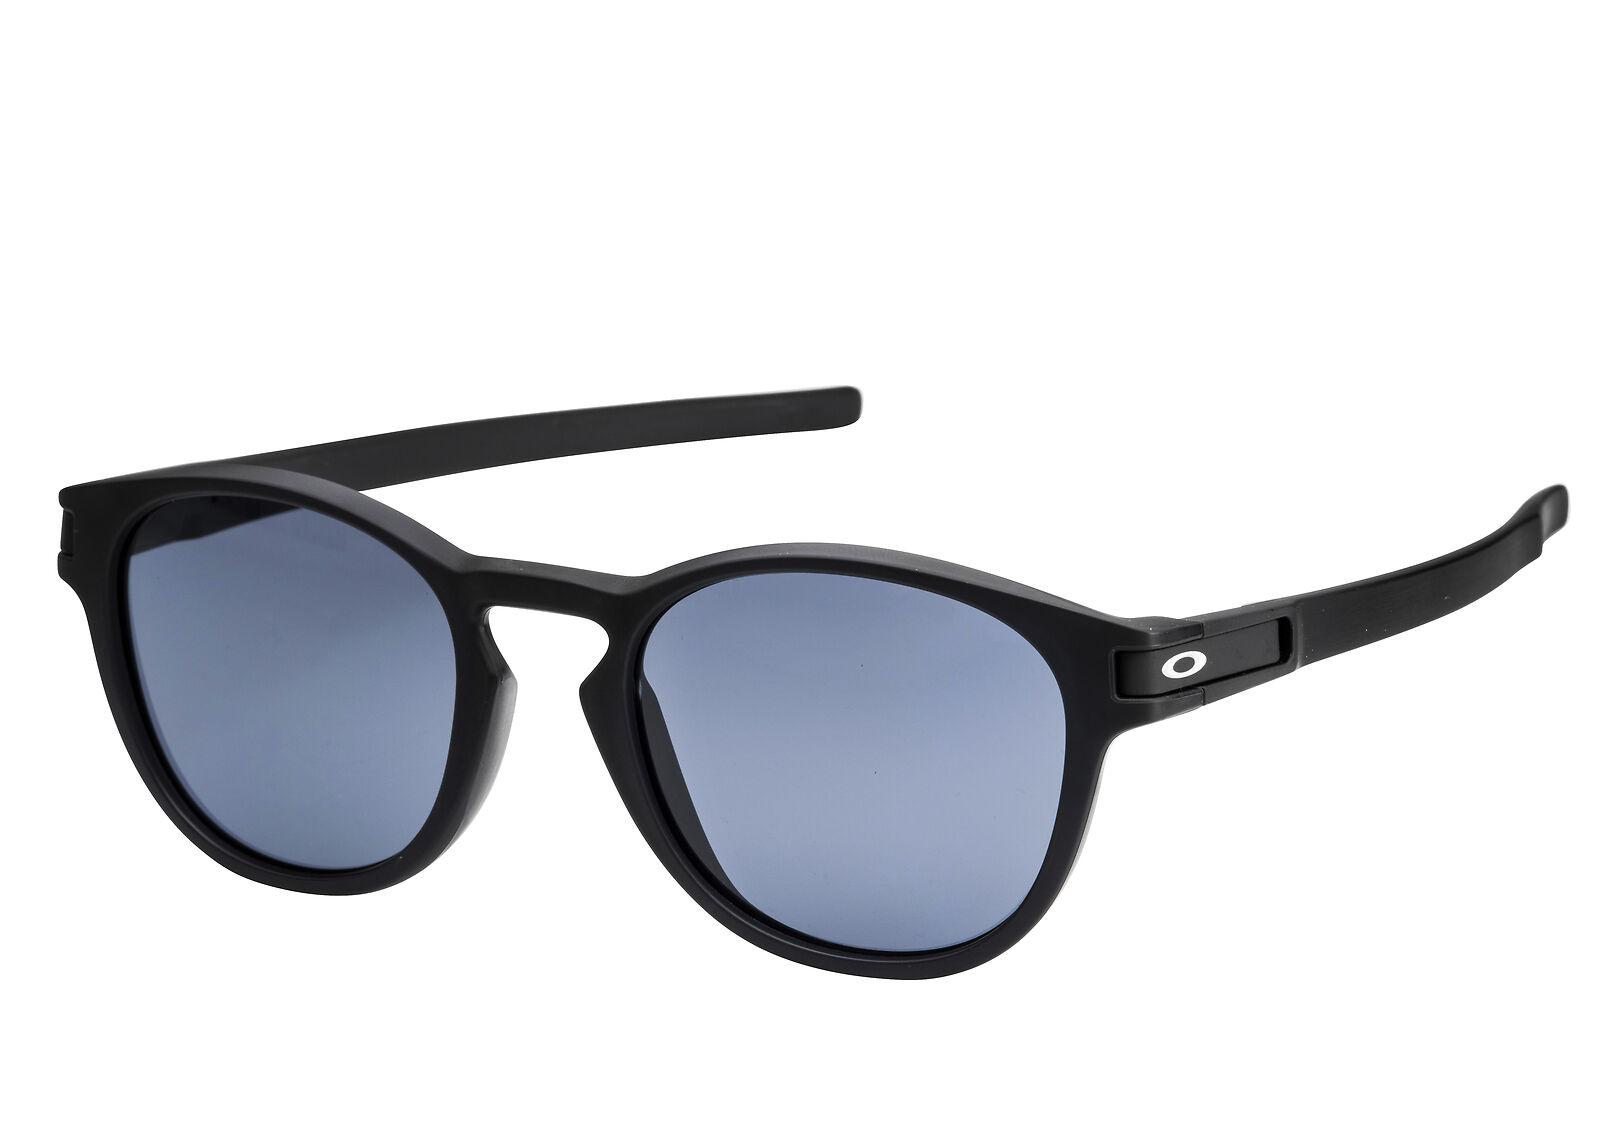 f782c6c93734 Oakley LATCH (Asia Fit) Sunglasses OO9349-01 Matte Black Grey Lens 9349-01